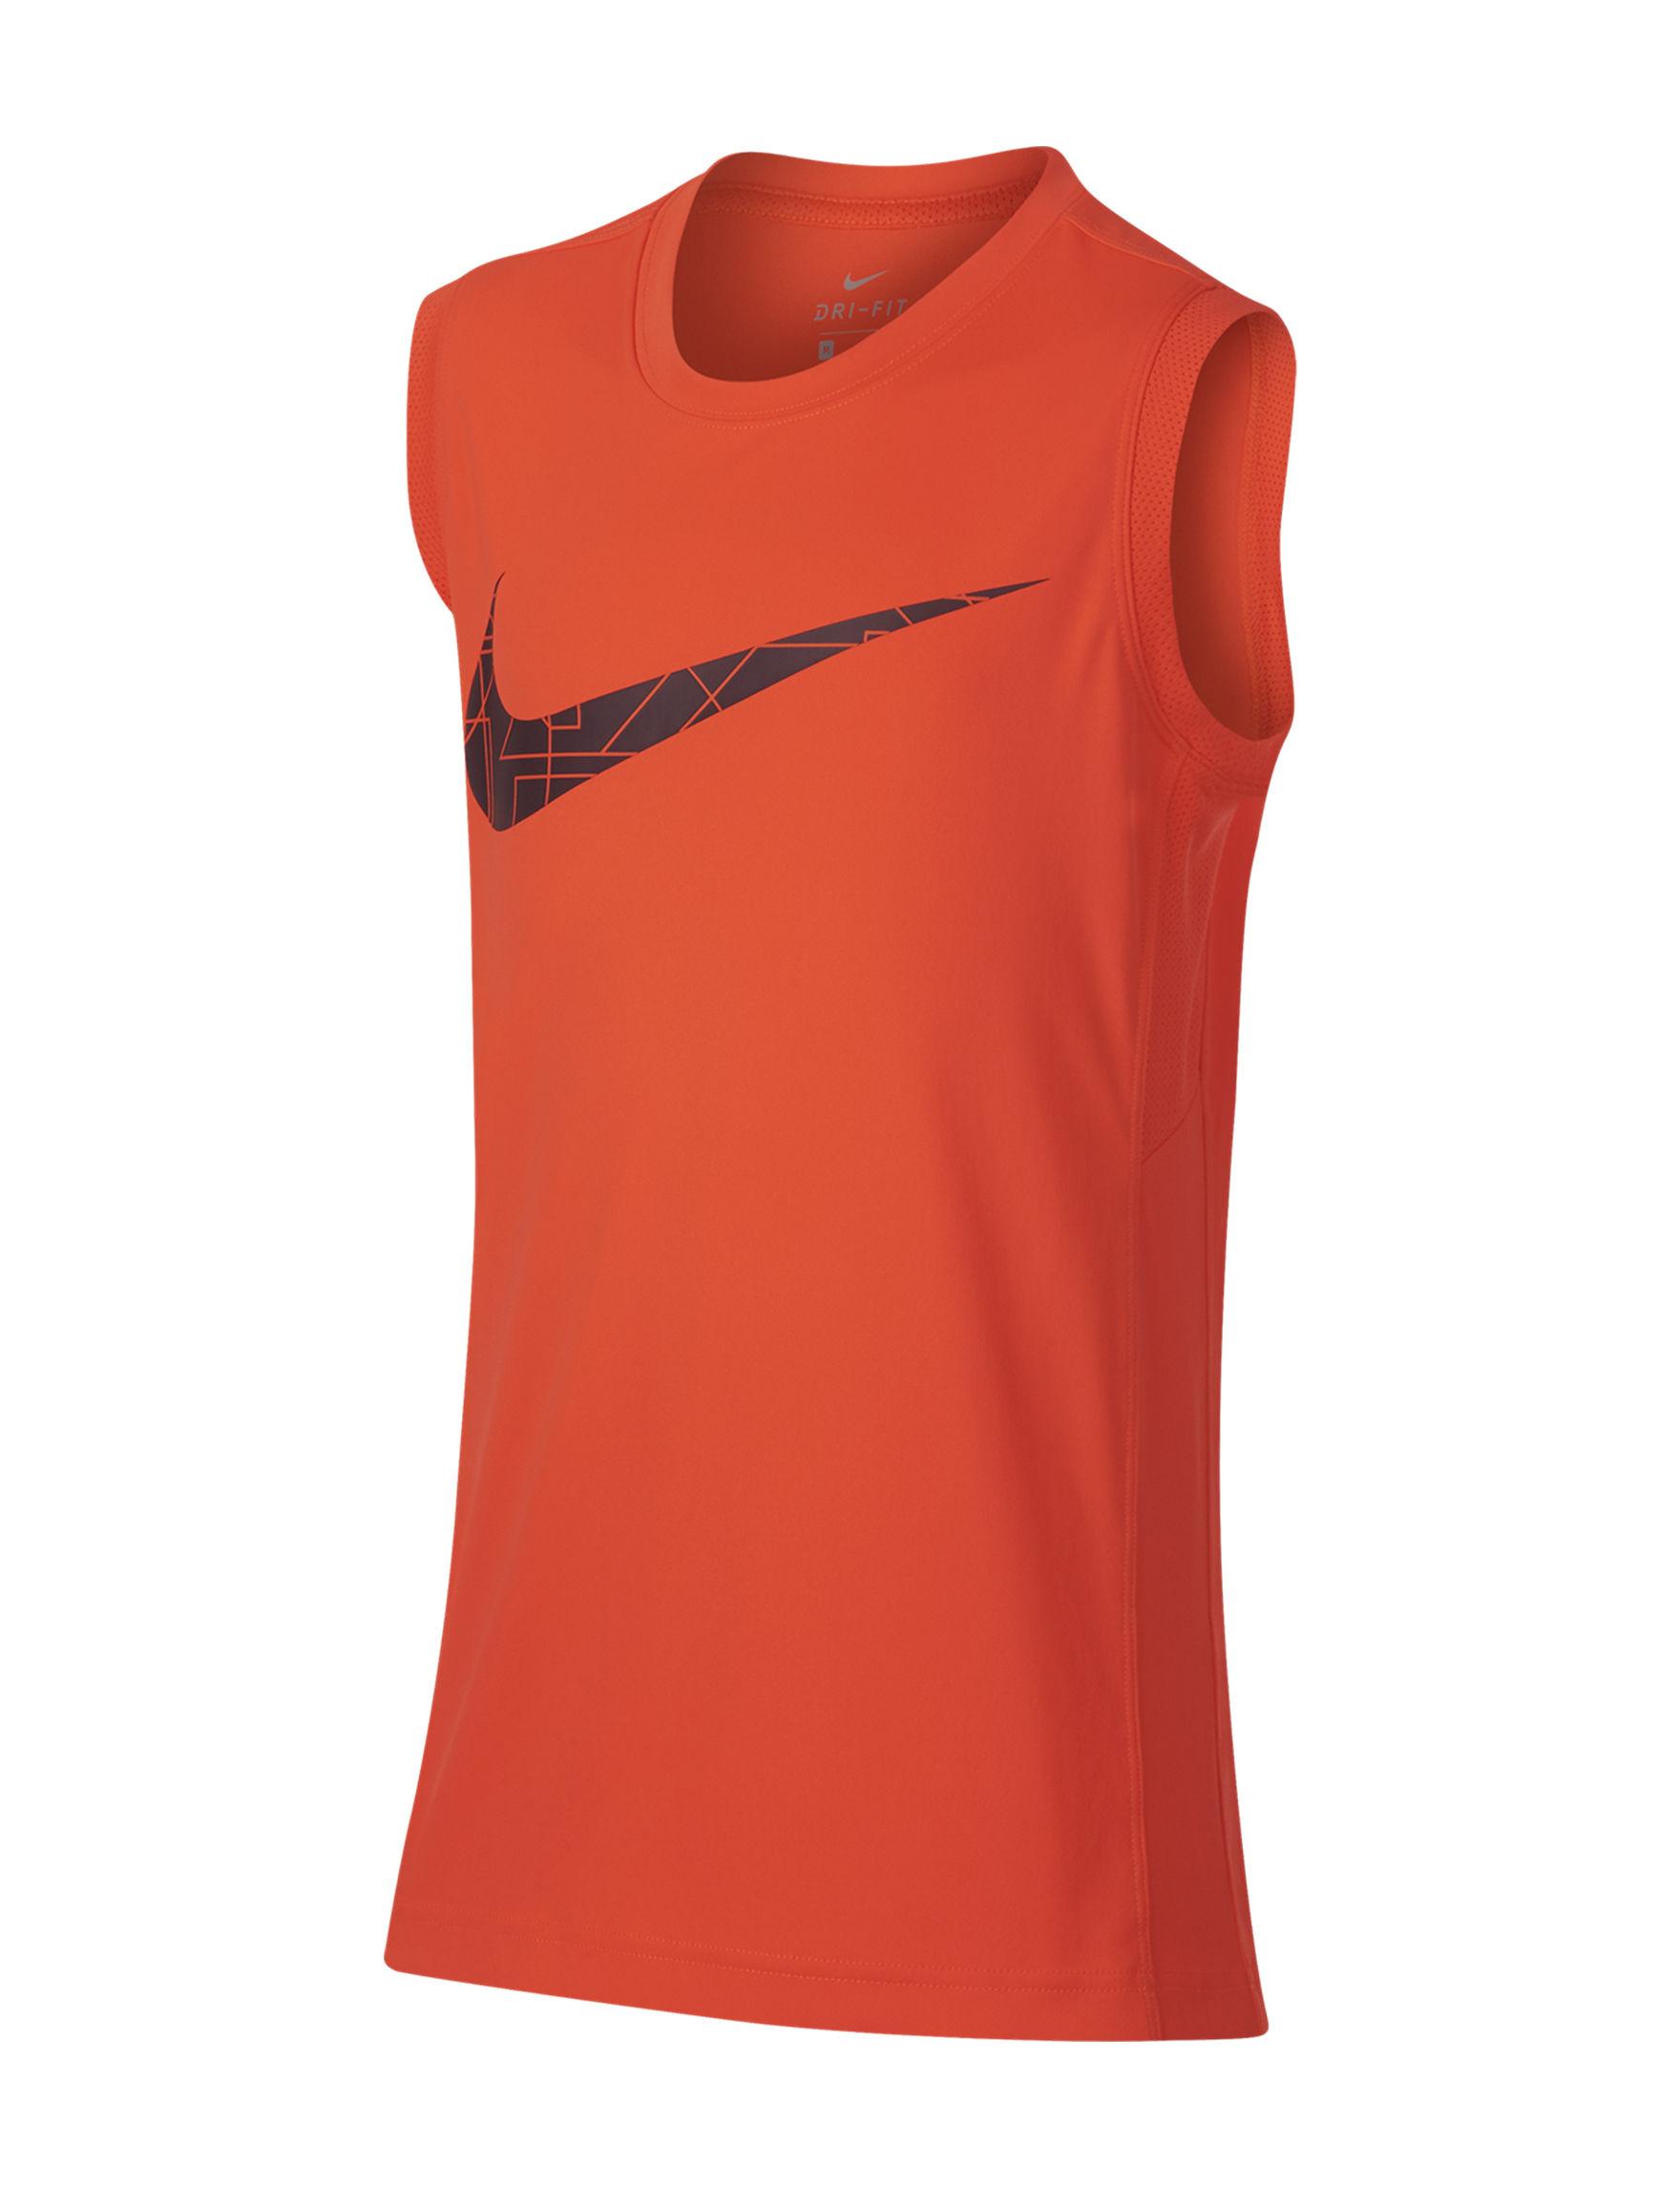 Nike Dark Orange